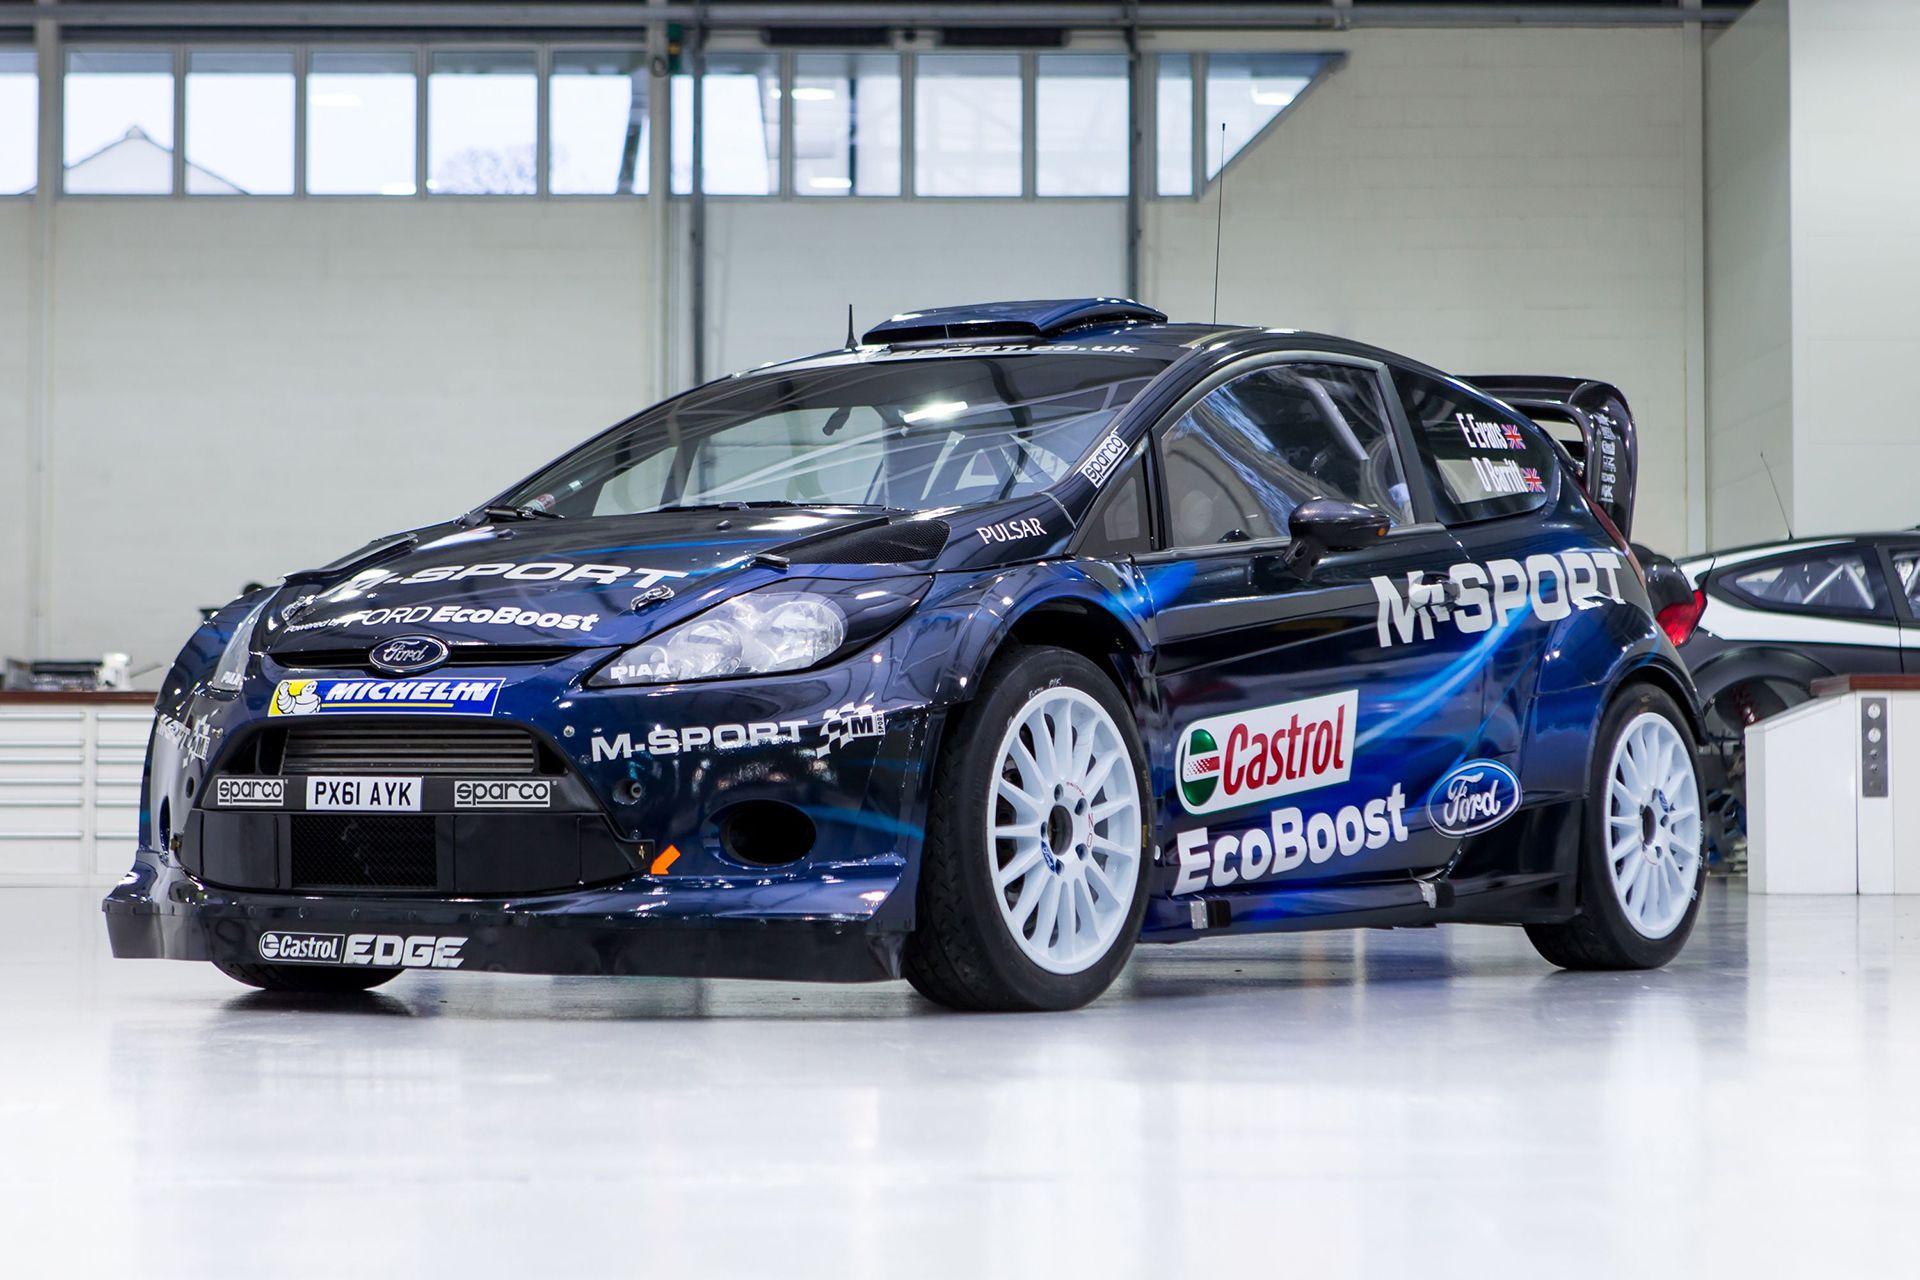 Ford Fiesta Wrc 2014 The Car For Mikko Hiervonen And Elfyn Evans